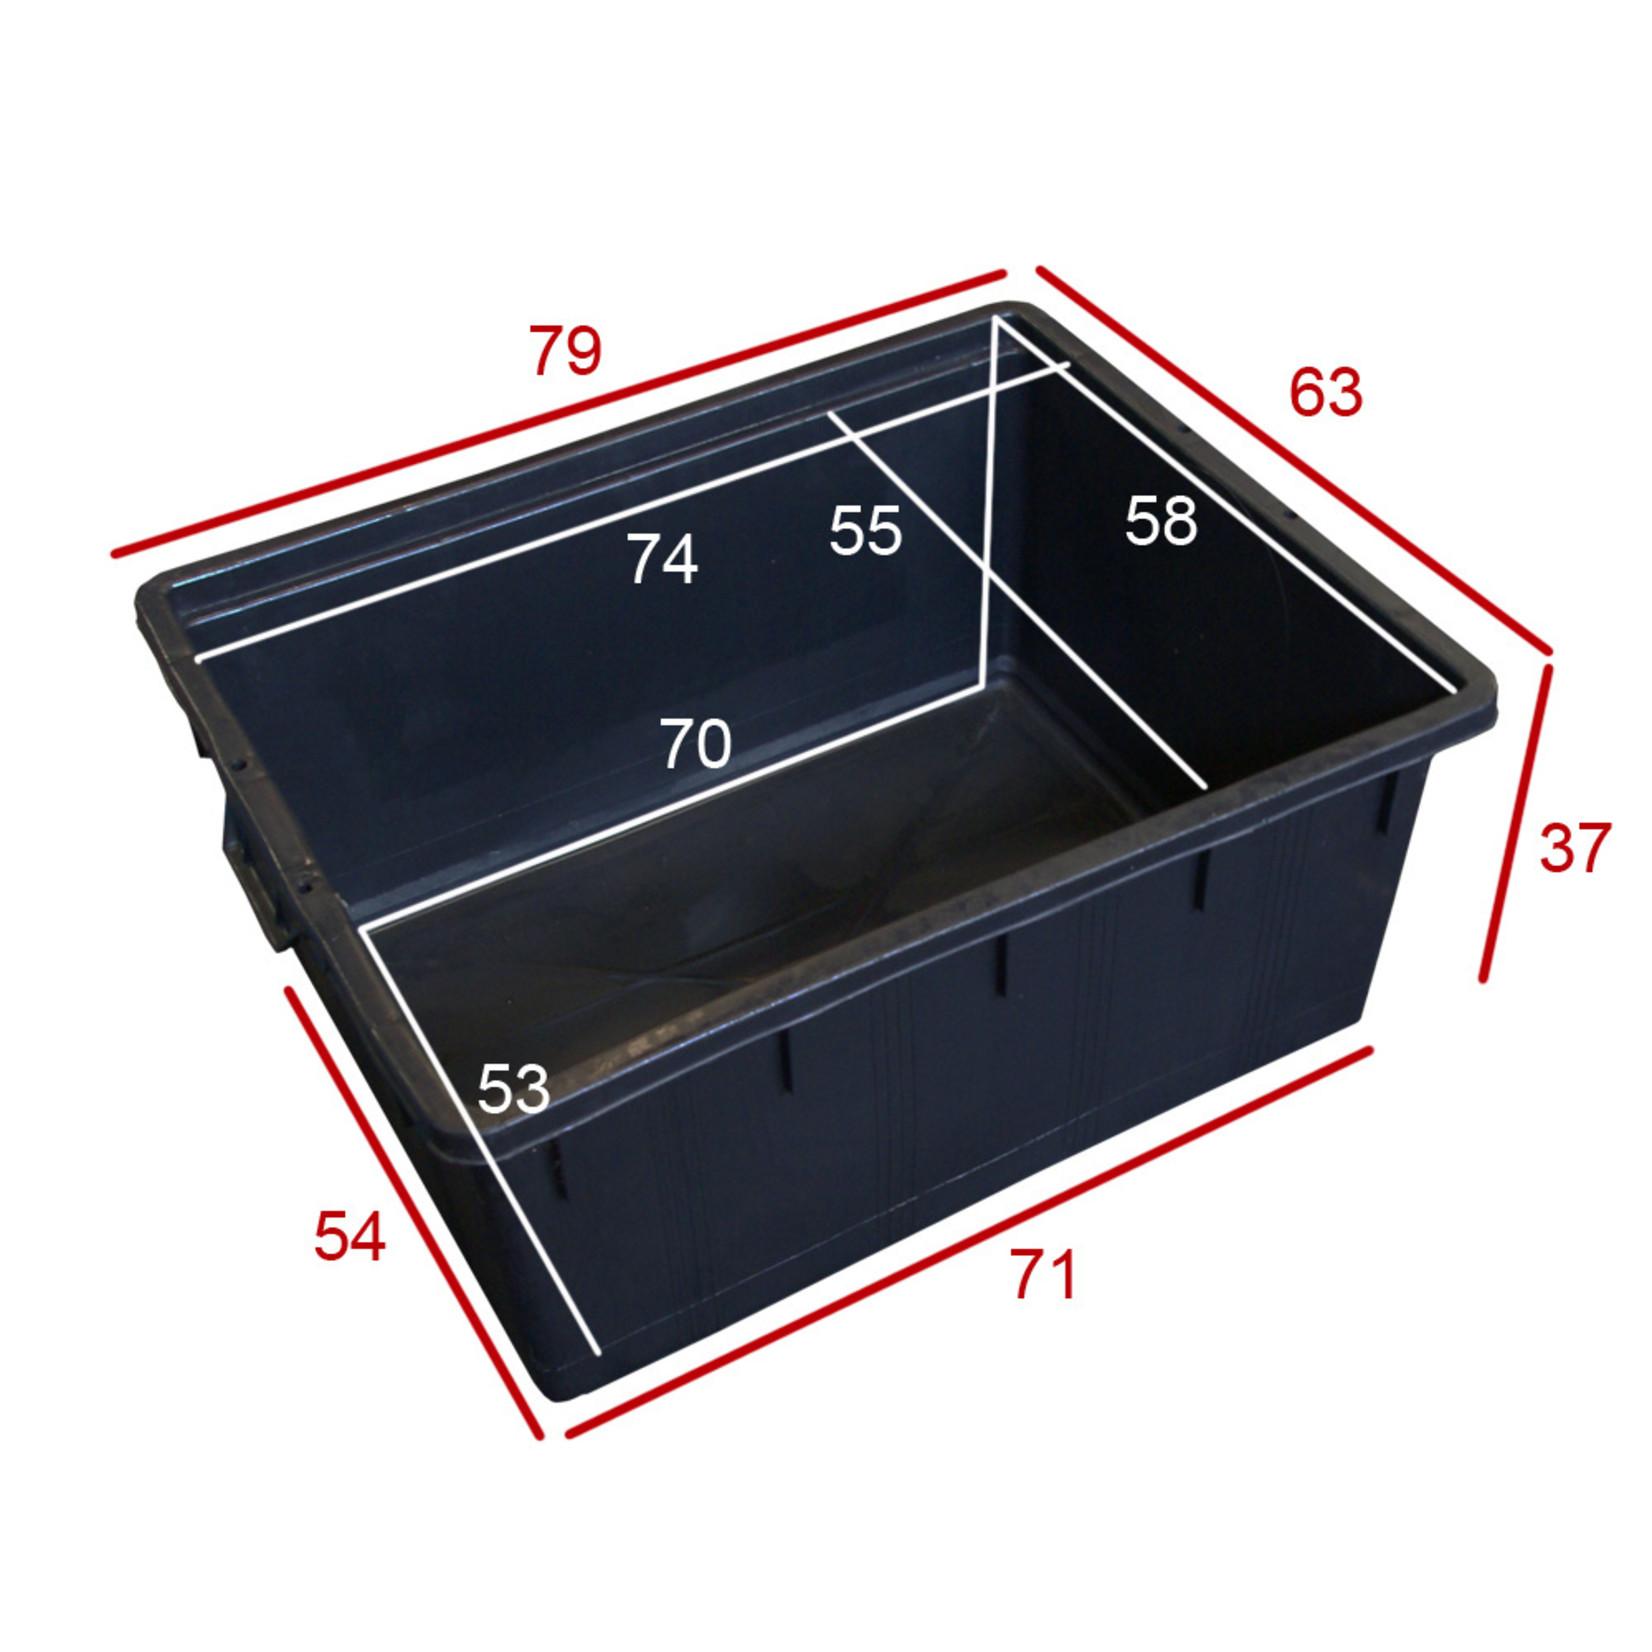 Rechthoek kuip 150 liter l.80 x b.63 x h.38 cm